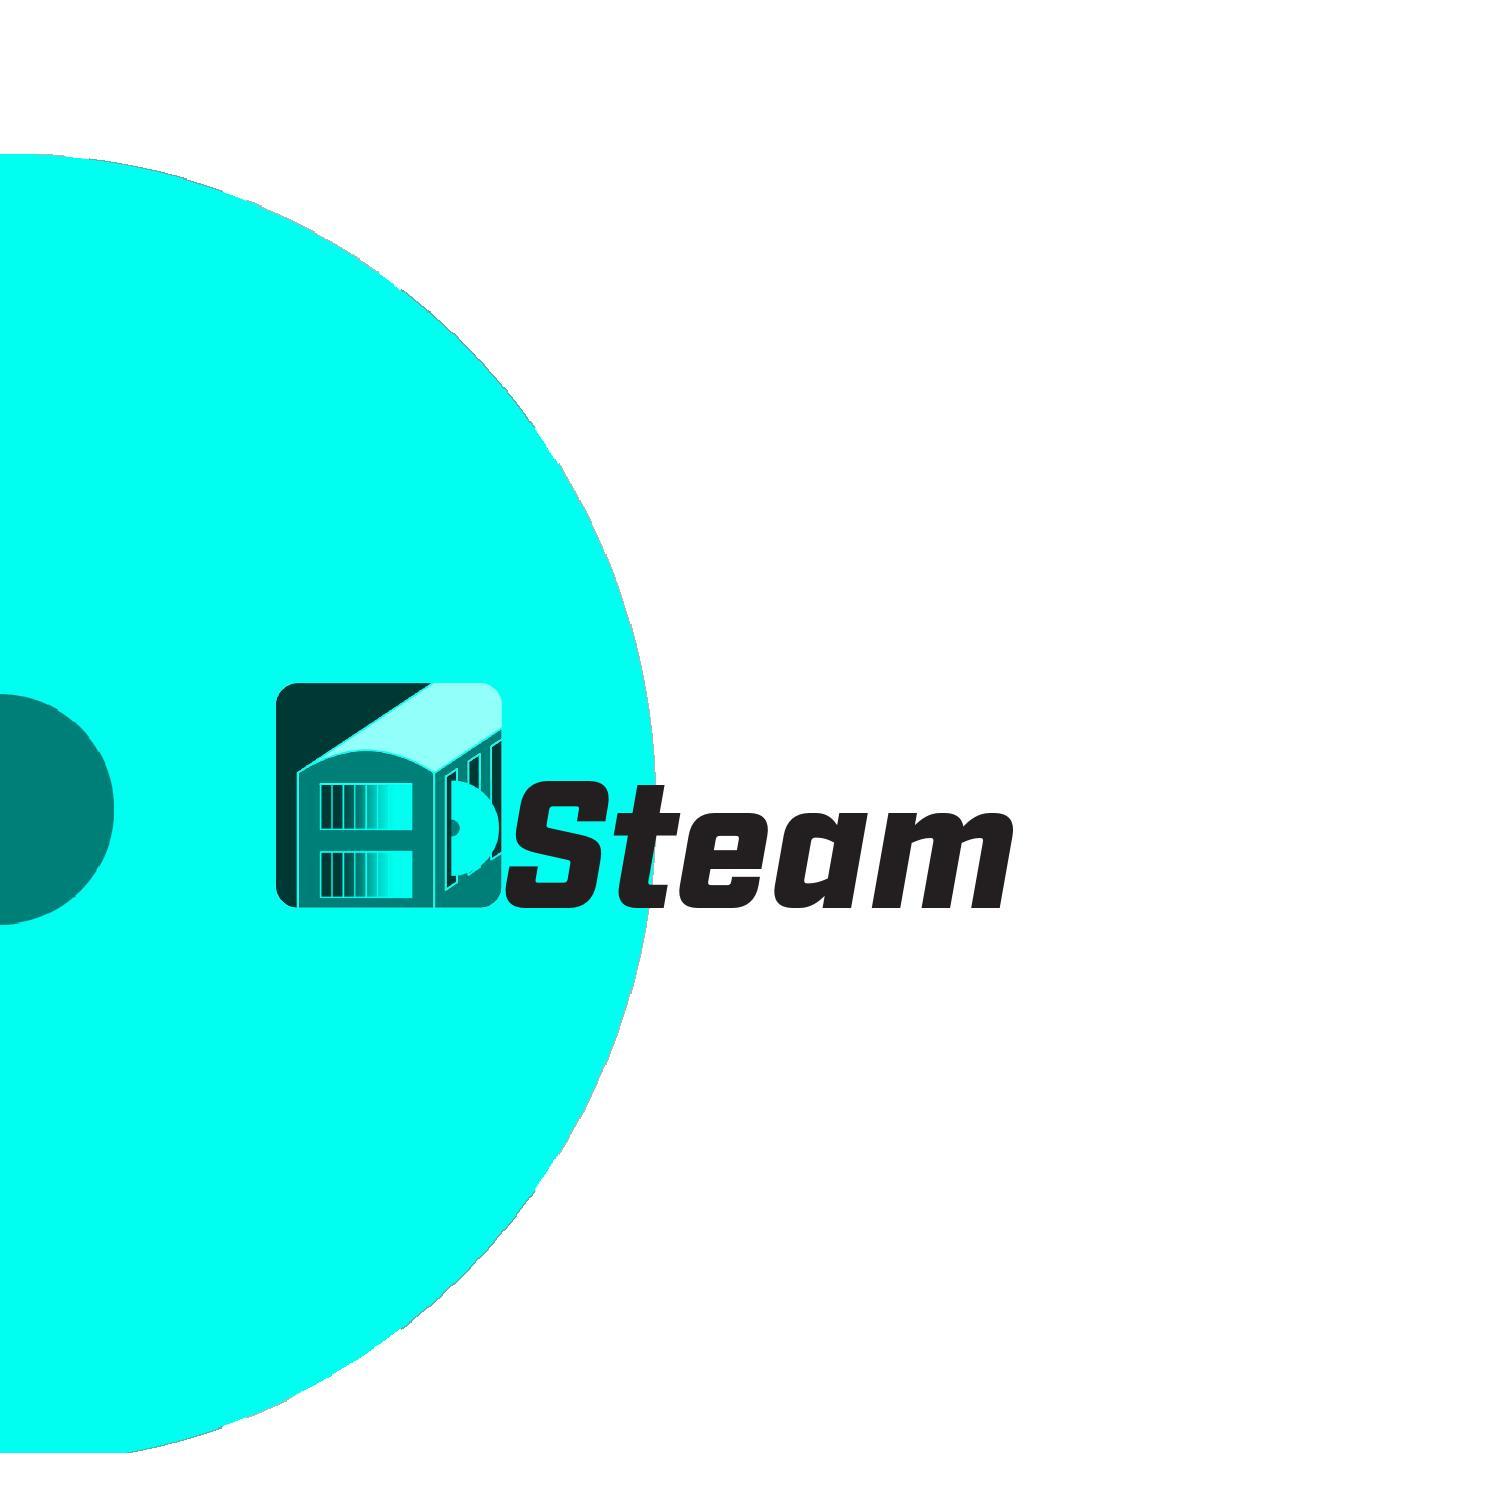 Steam ReBrand Project by Asakiyoshi issuu